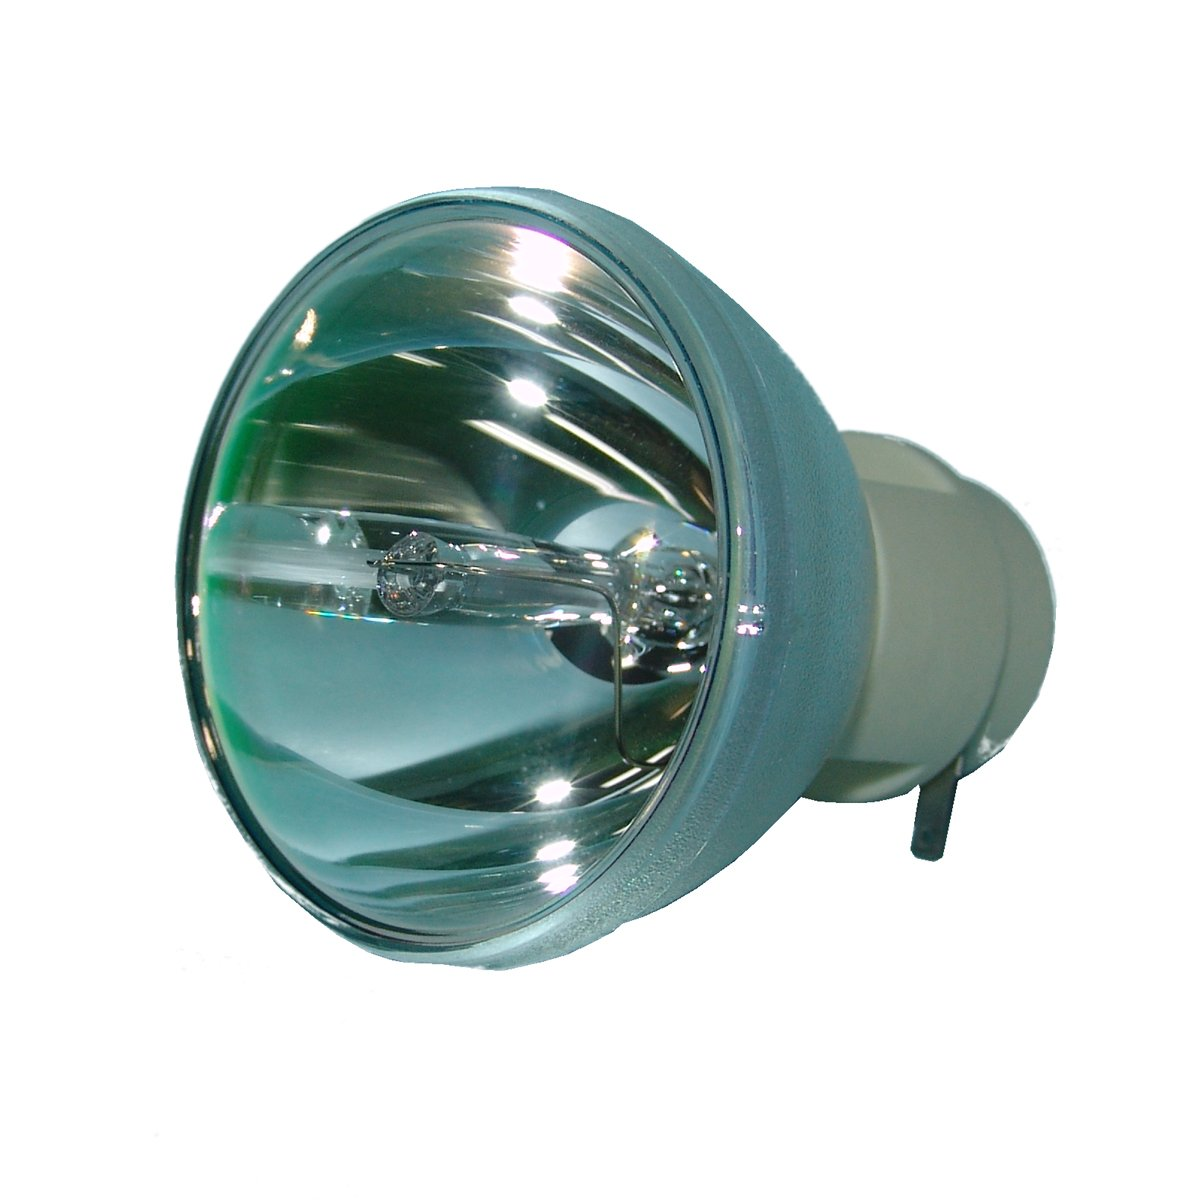 Lutema OEM 交換用ランプ ハウジング/バルブ付き Vivitek 5811119760-SV用 Platinum (Brighter/Durable) B07KTKRBNS  Lamp Only Platinum (Brighter/Durable)